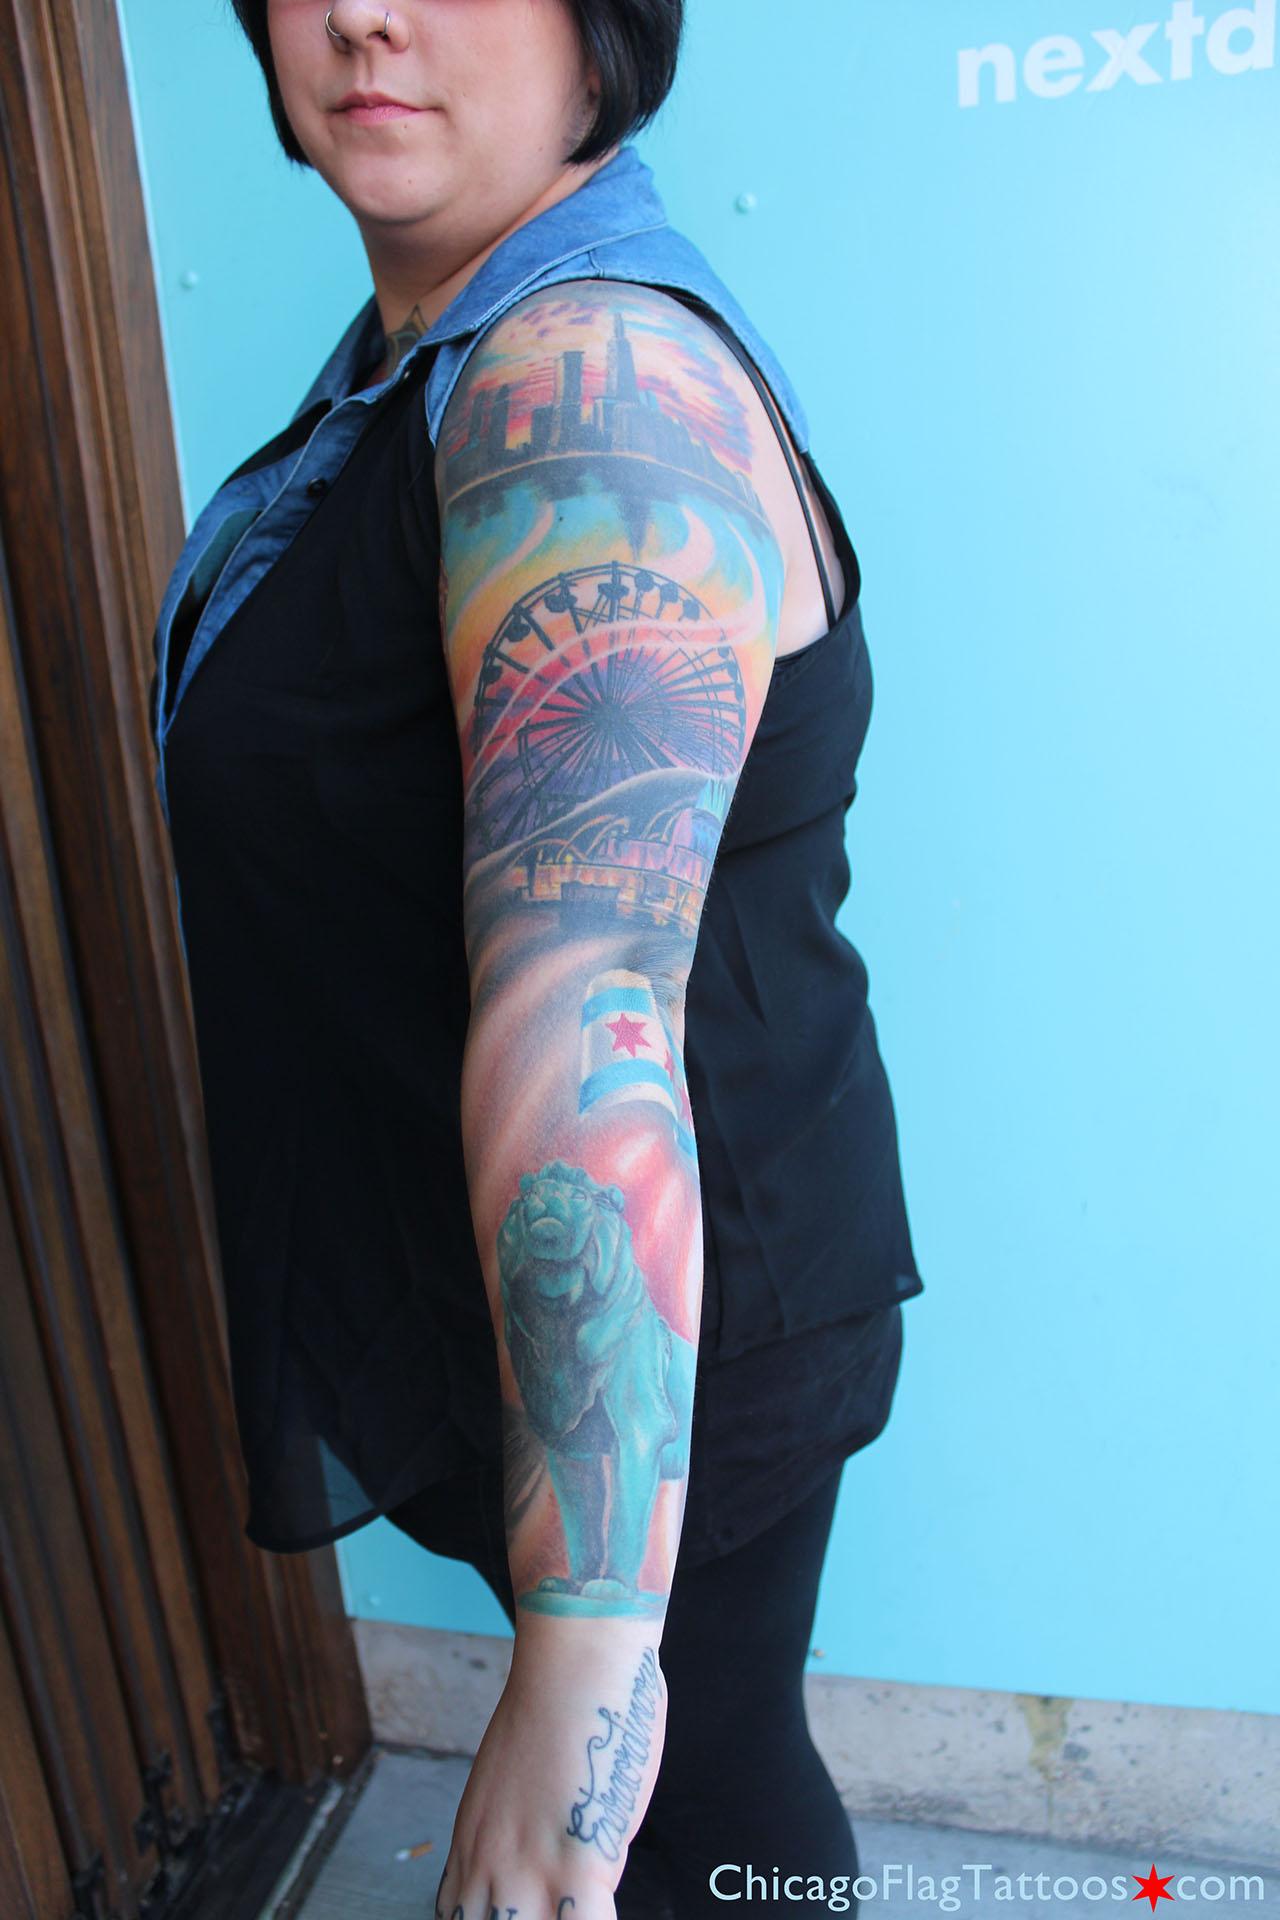 http://chicagoflagtattoos.com/img/kayla-tattoo-skyline-ferris-lion.jpg